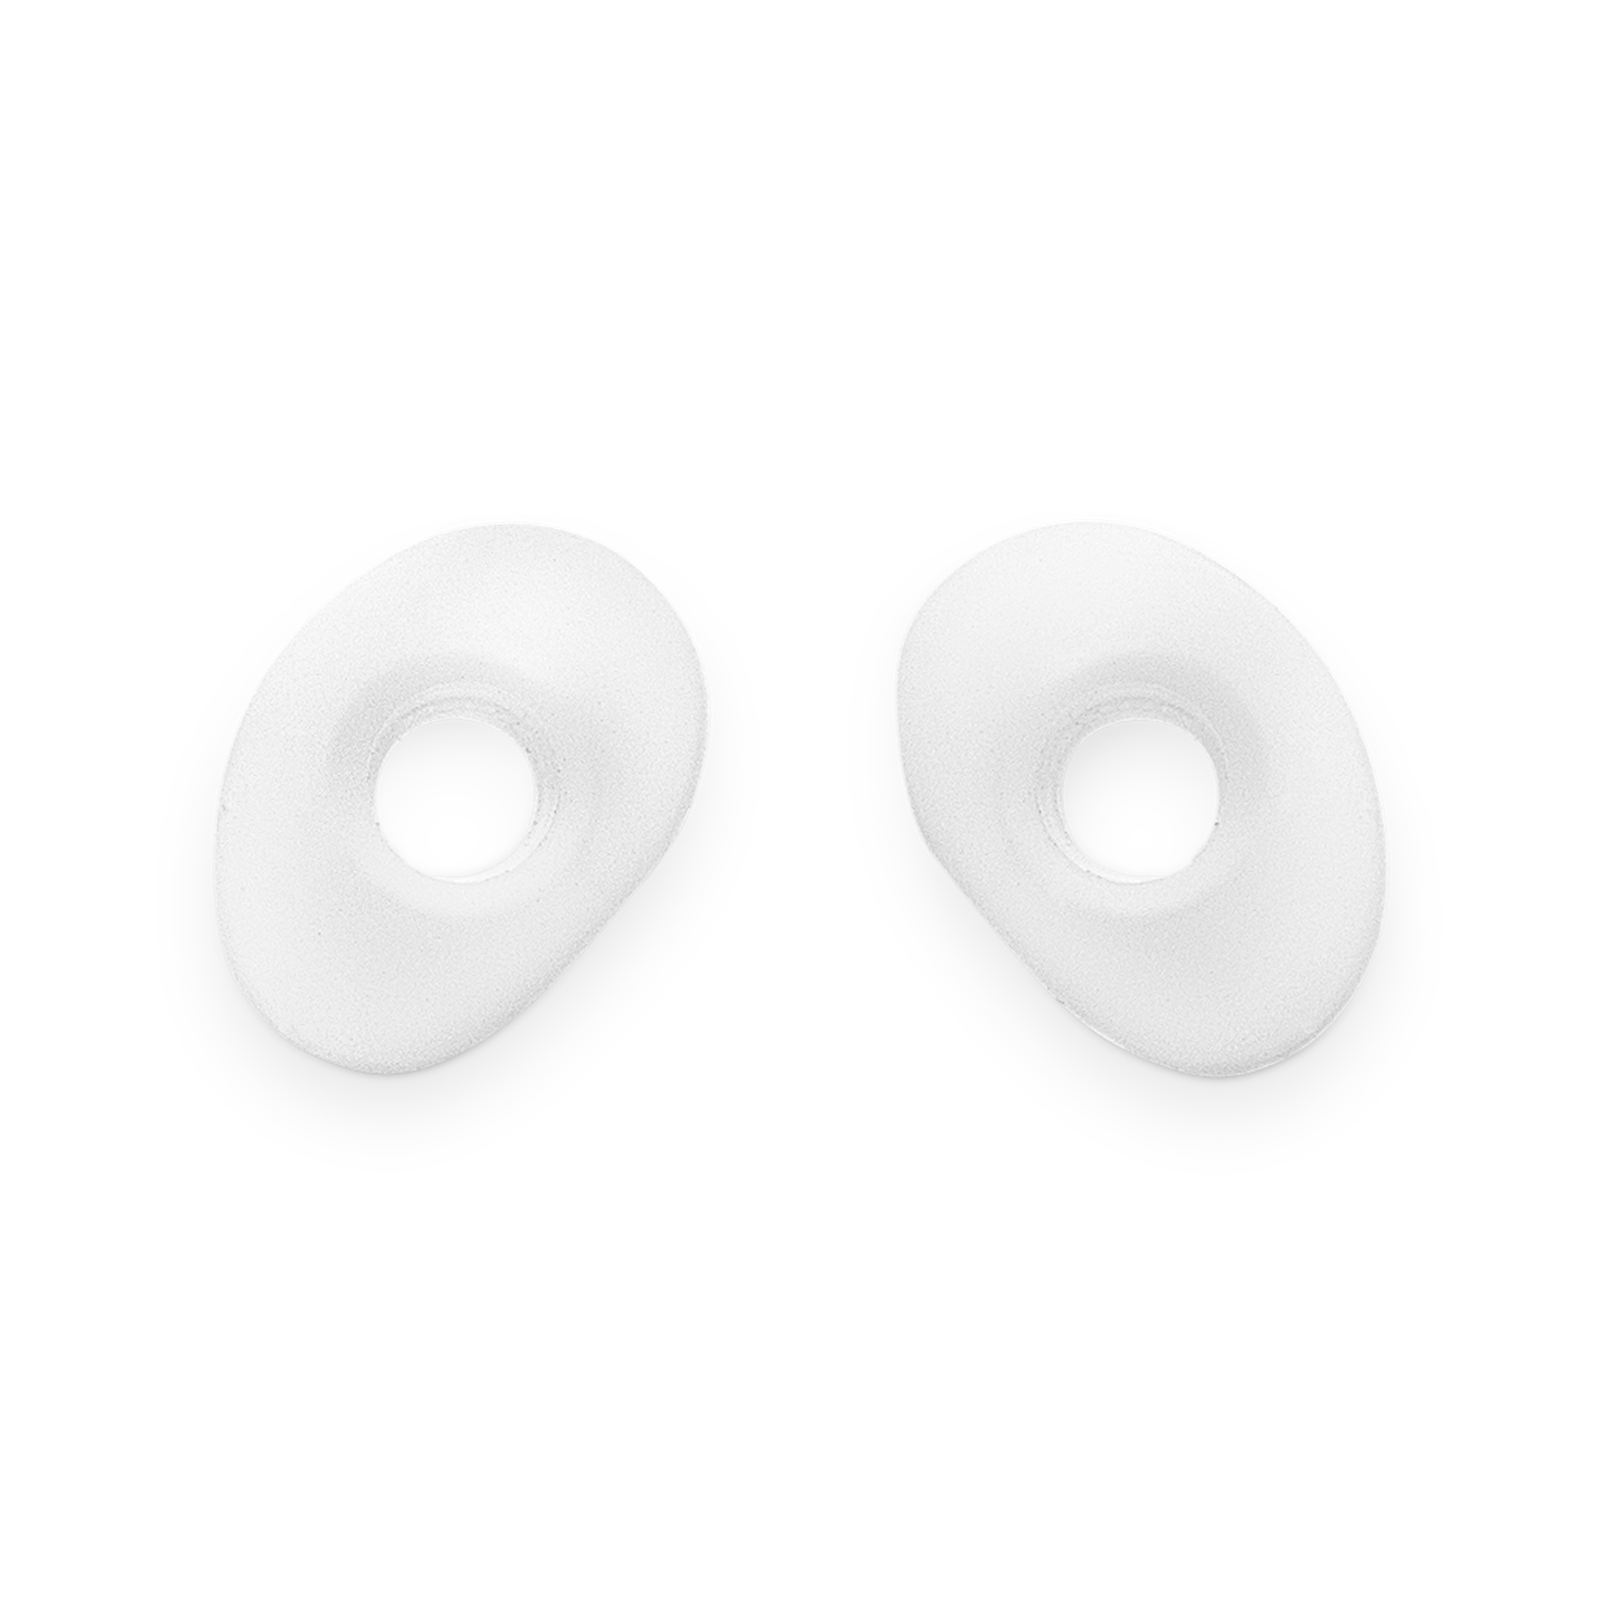 Ear hook set for Reflect fit (Medium)